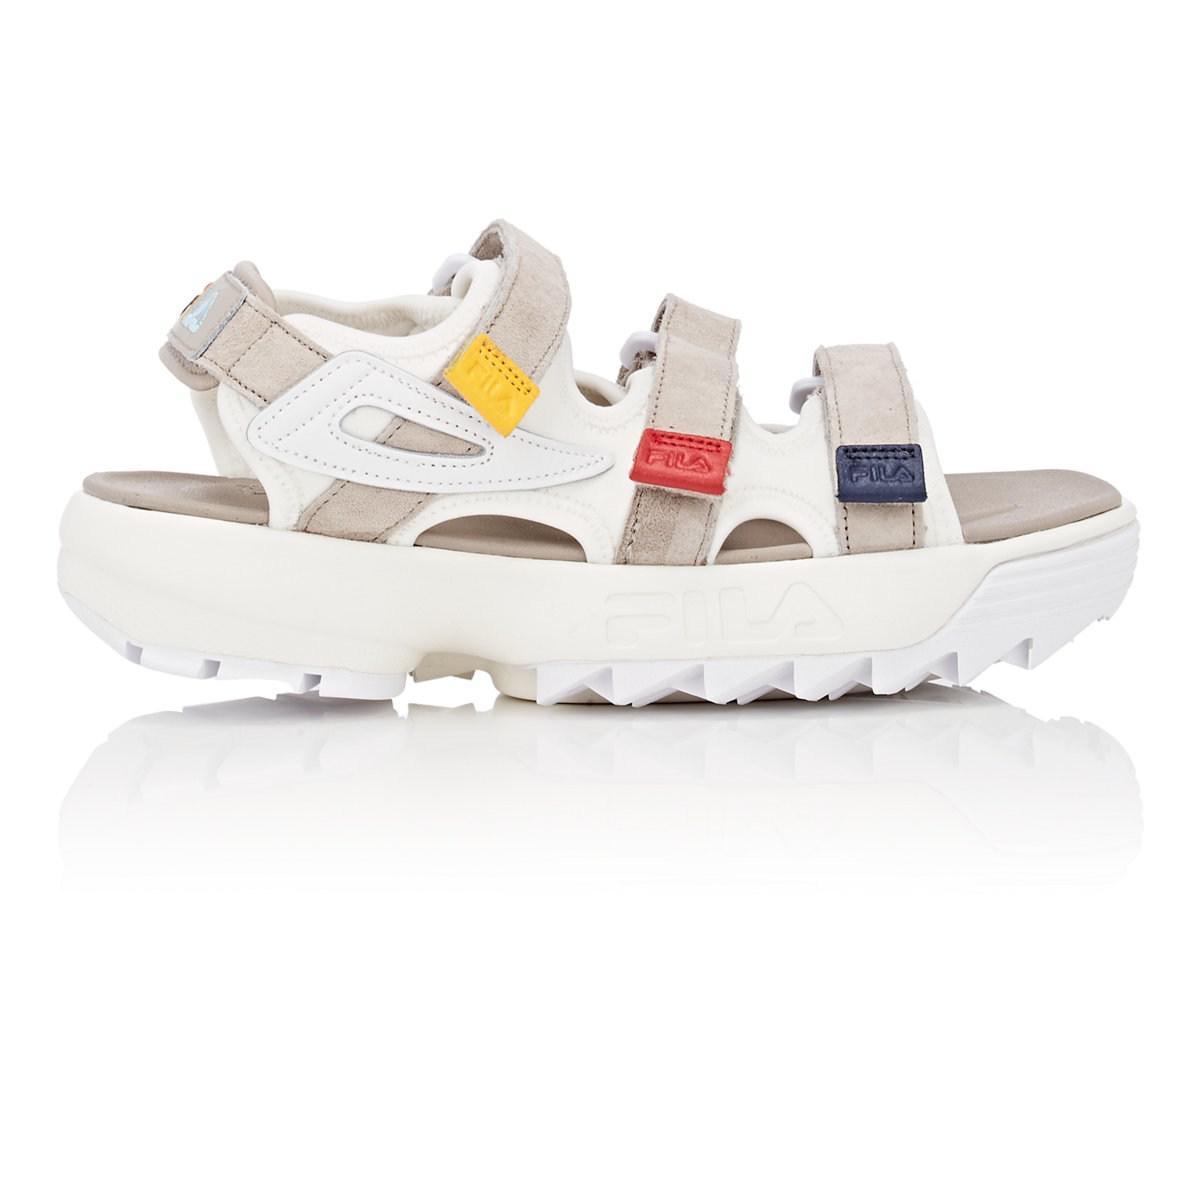 ea030e1c71f8 Lyst - Fila Disruptor Suede   Neoprene Sandals in White